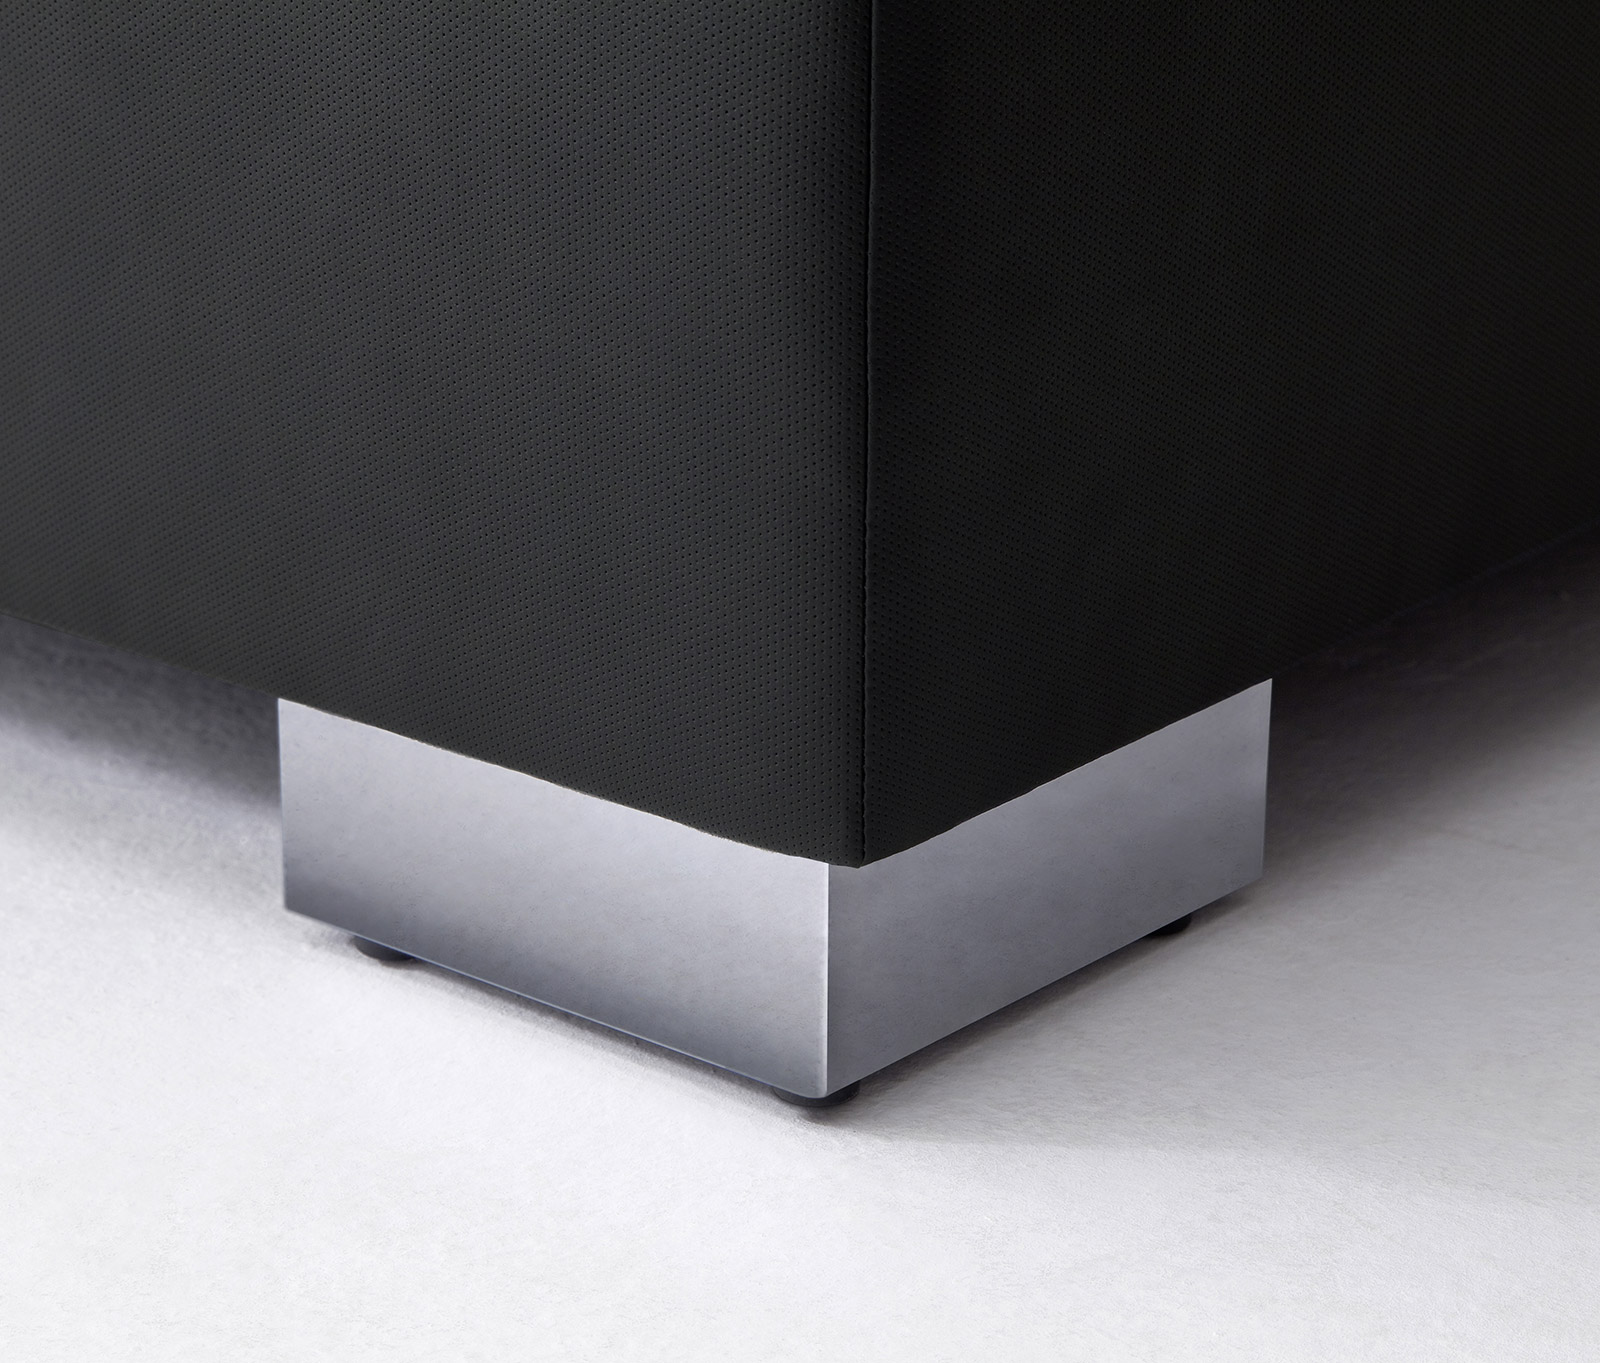 Boxspringbett metall  Boxspringbett mit Topper bis 150 kg belastbar - Siliana